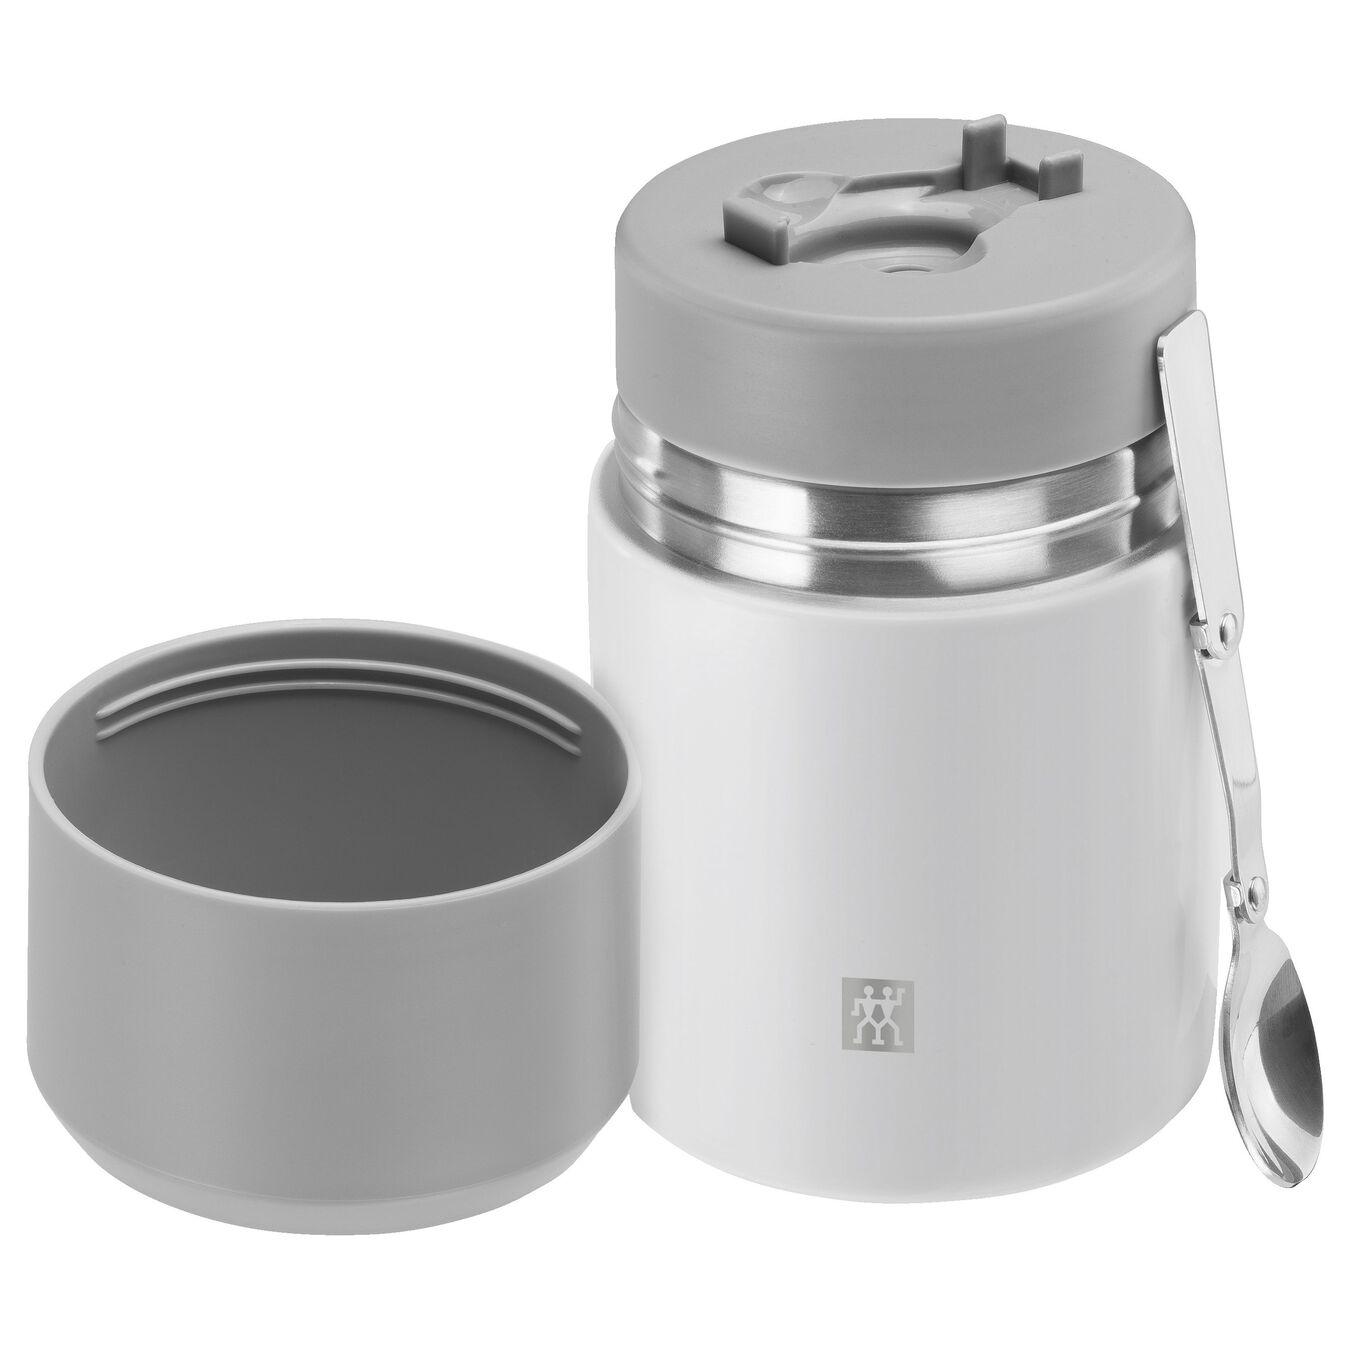 Recipiente alimentare - 700 ml, acciaio inox, bianco,,large 2